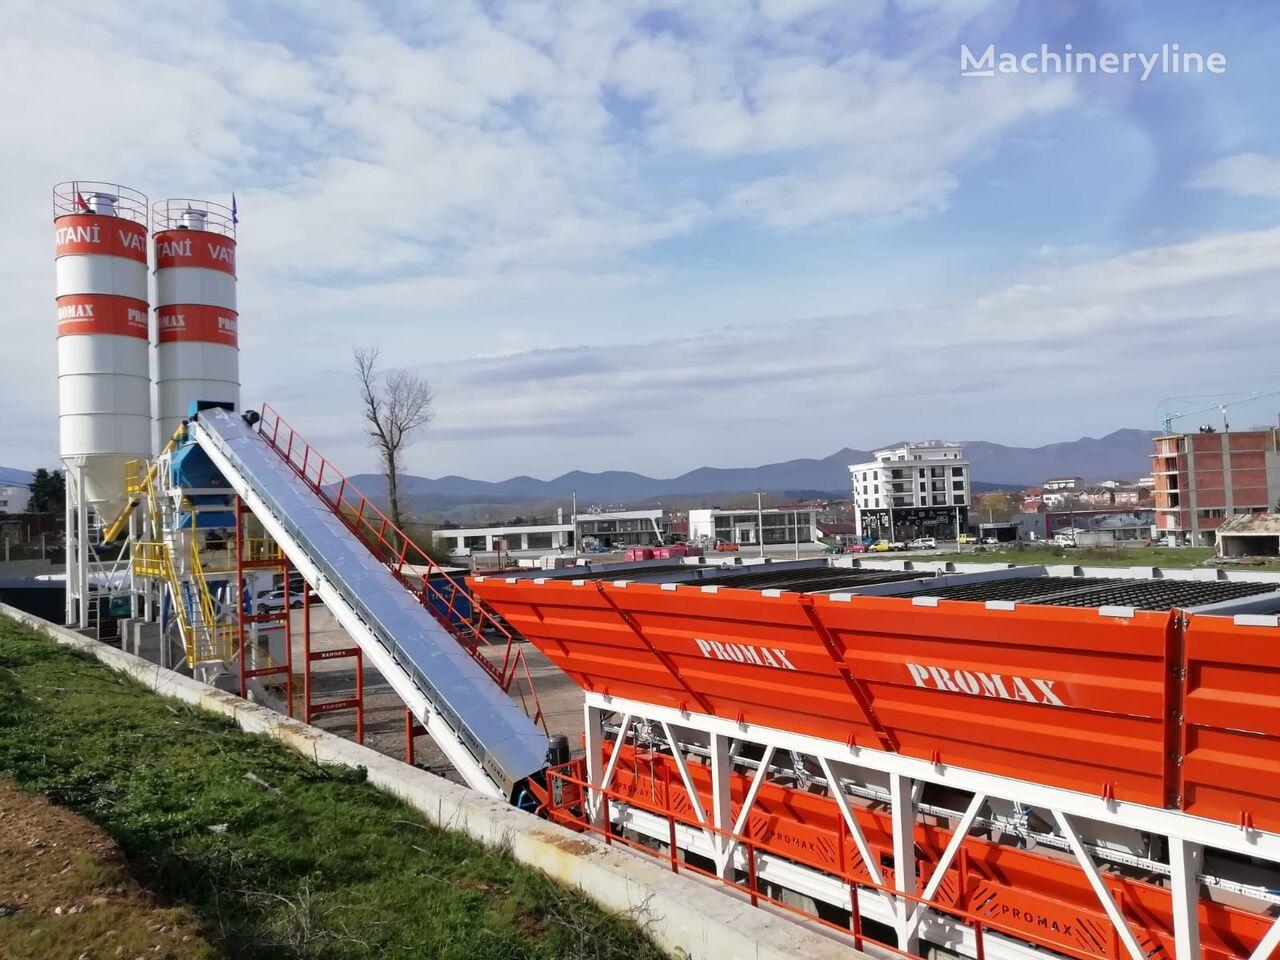 pabrik beton PROMAX Stationary Concrete Batching Plant S100 TWN (100m³/h) baru